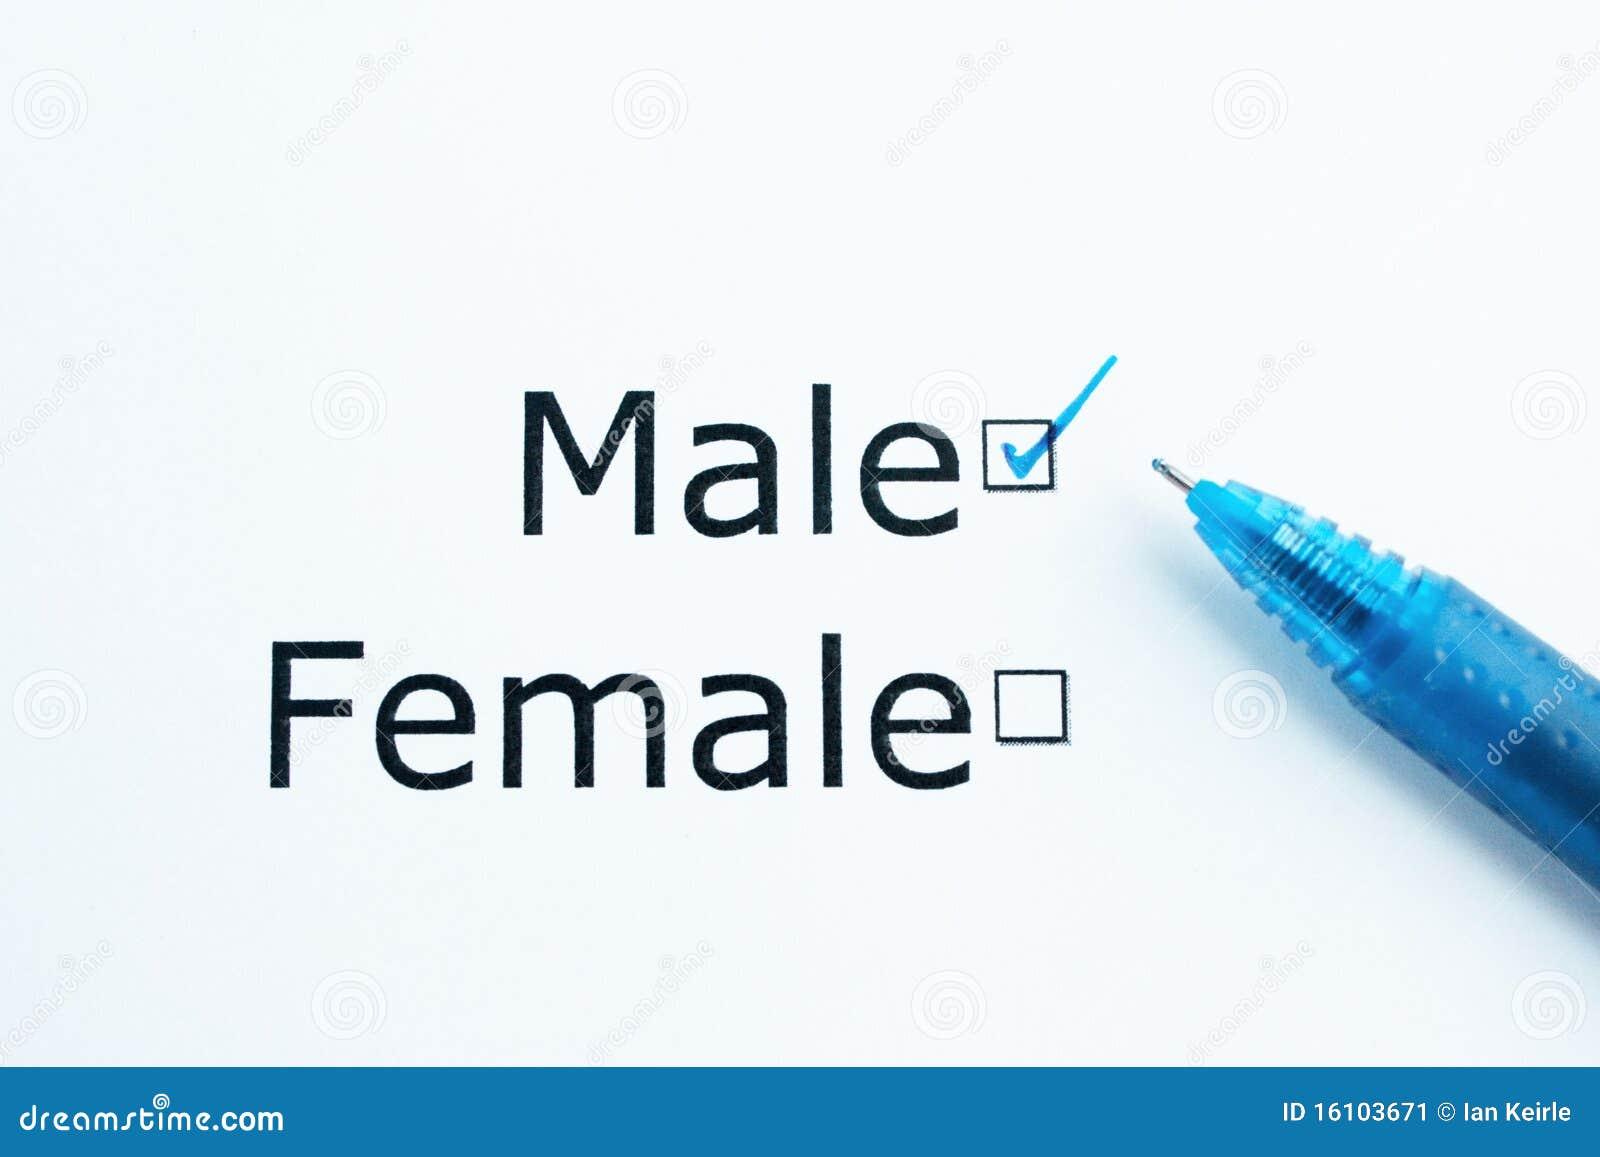 Gender question